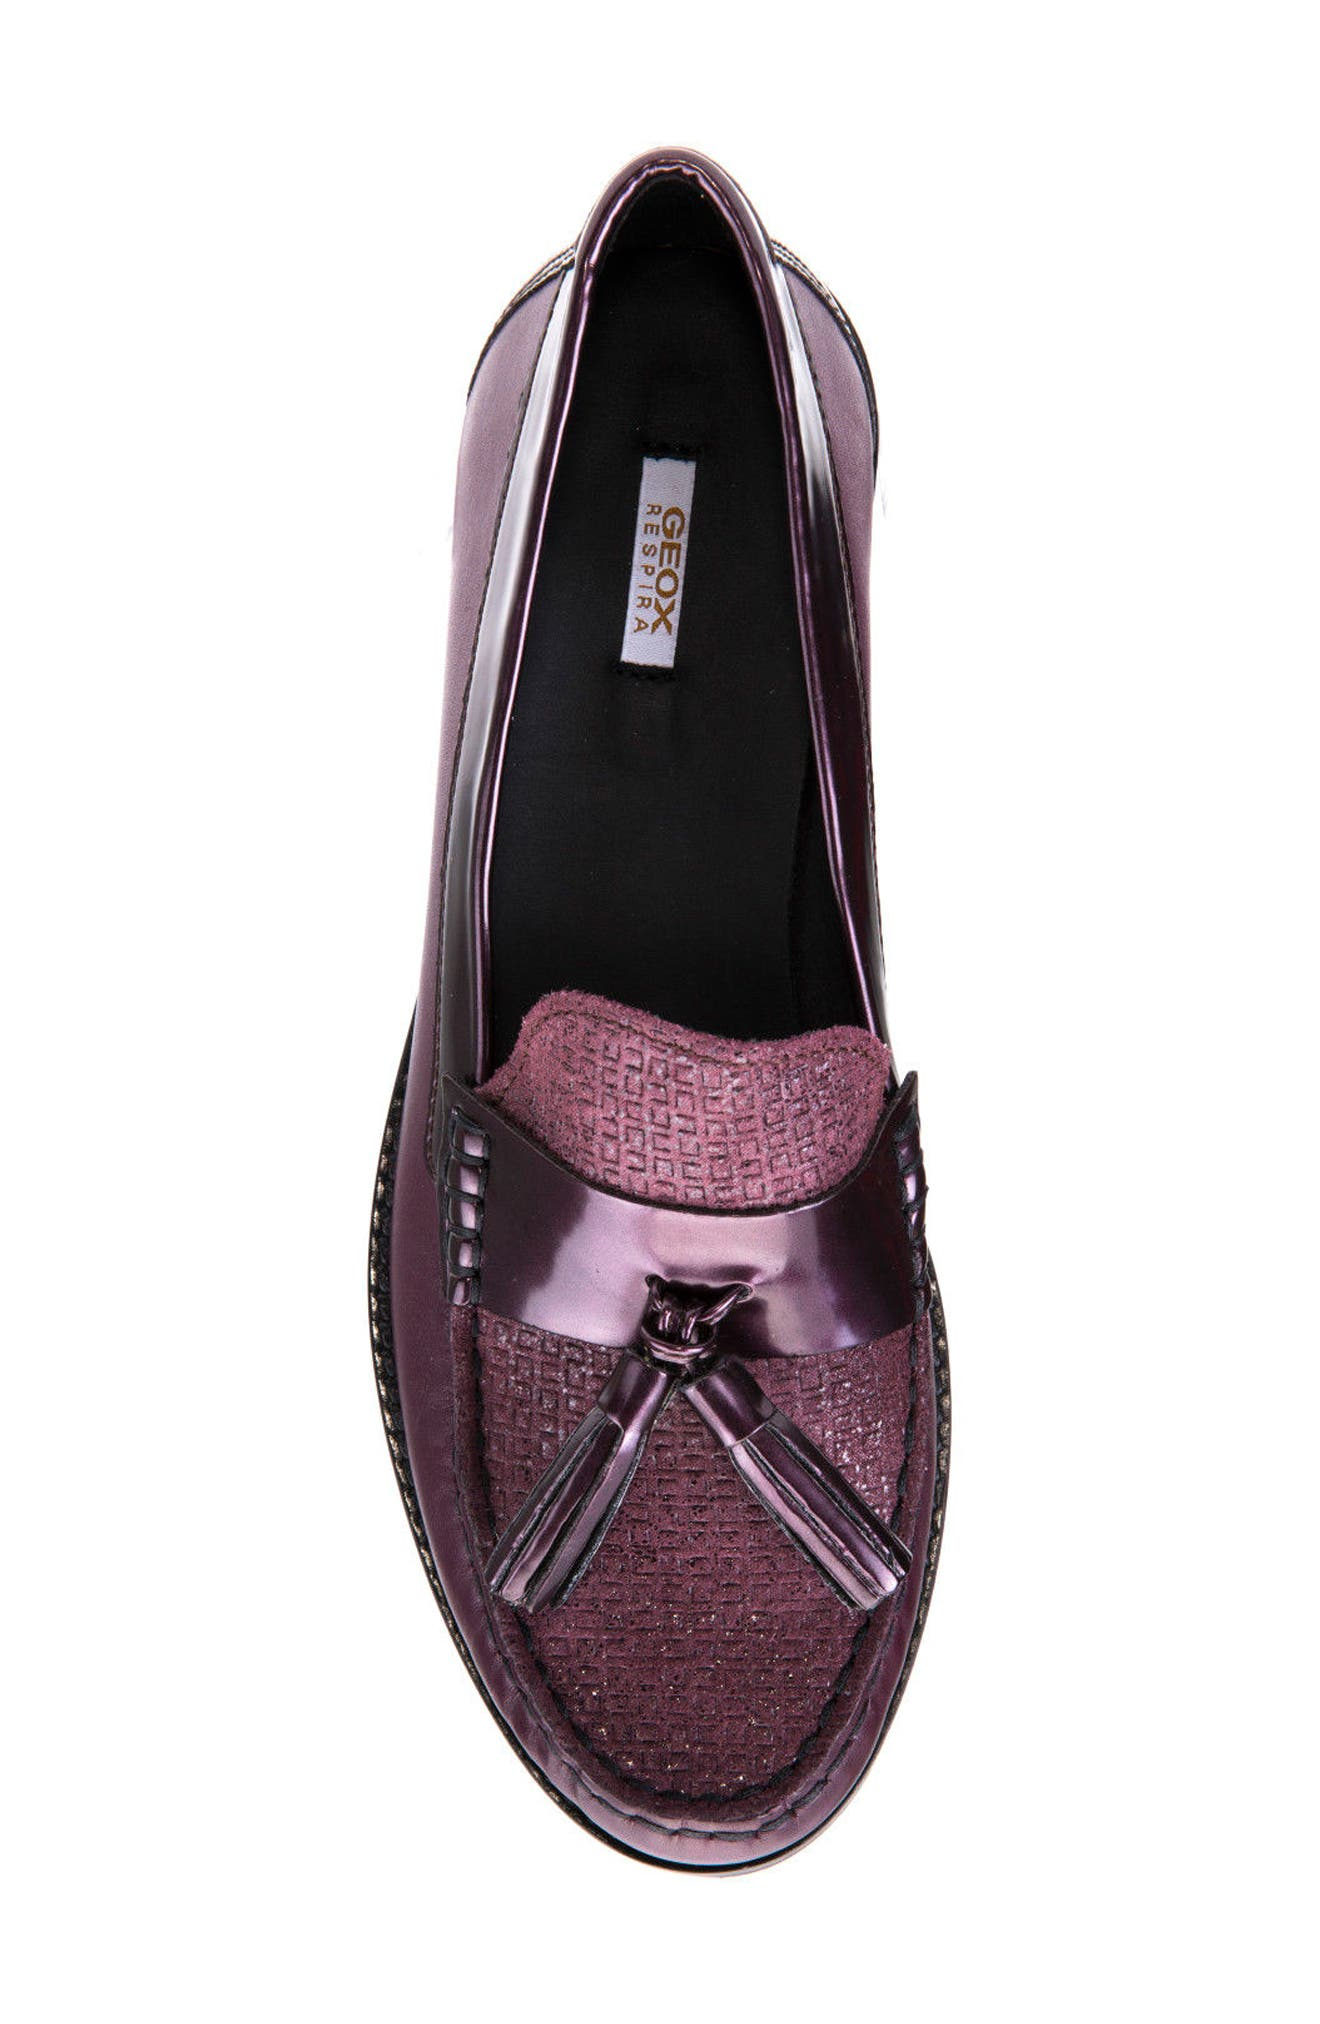 Promethea Loafer,                             Alternate thumbnail 6, color,                             Prune Leather